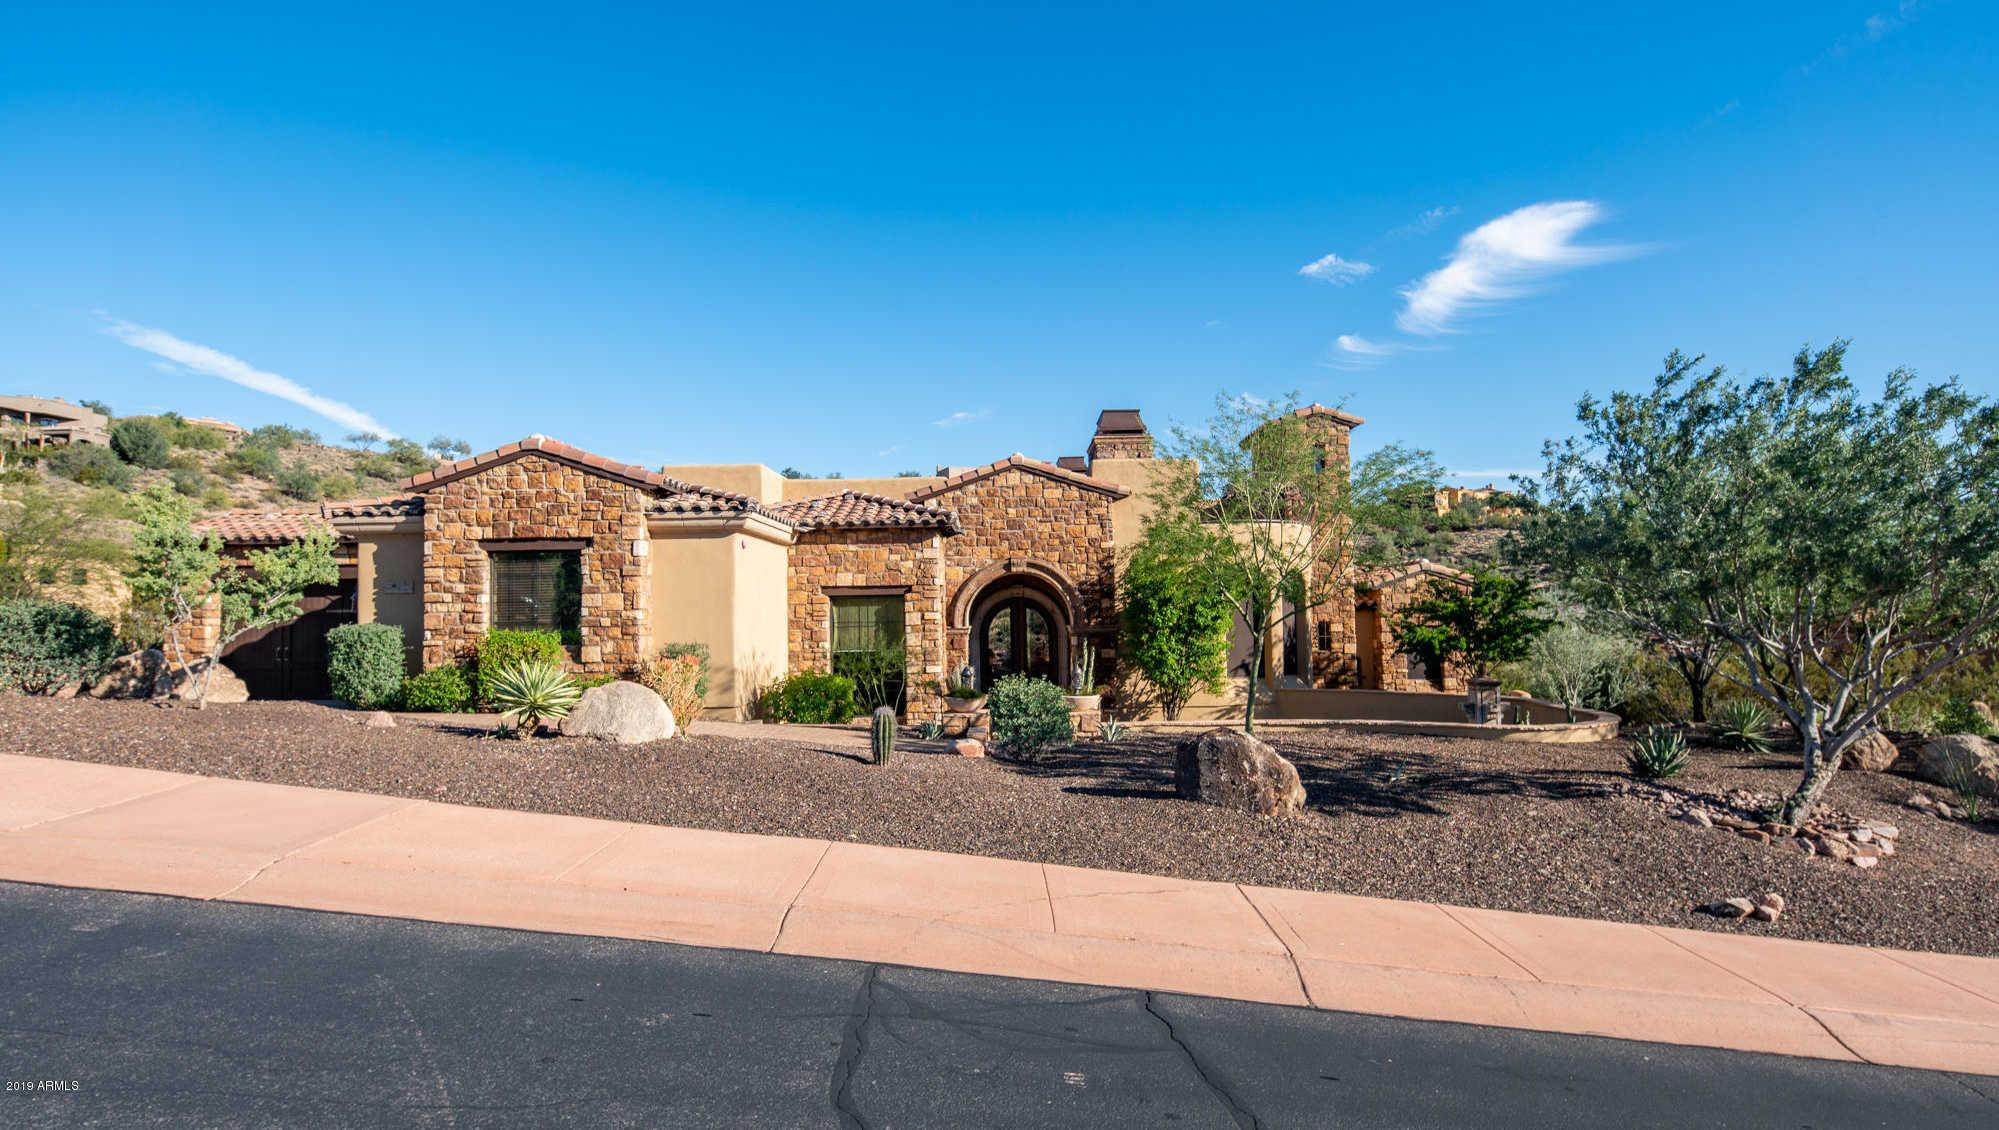 $1,549,900 - 4Br/6Ba - Home for Sale in Firerock Parcel L-2, Fountain Hills